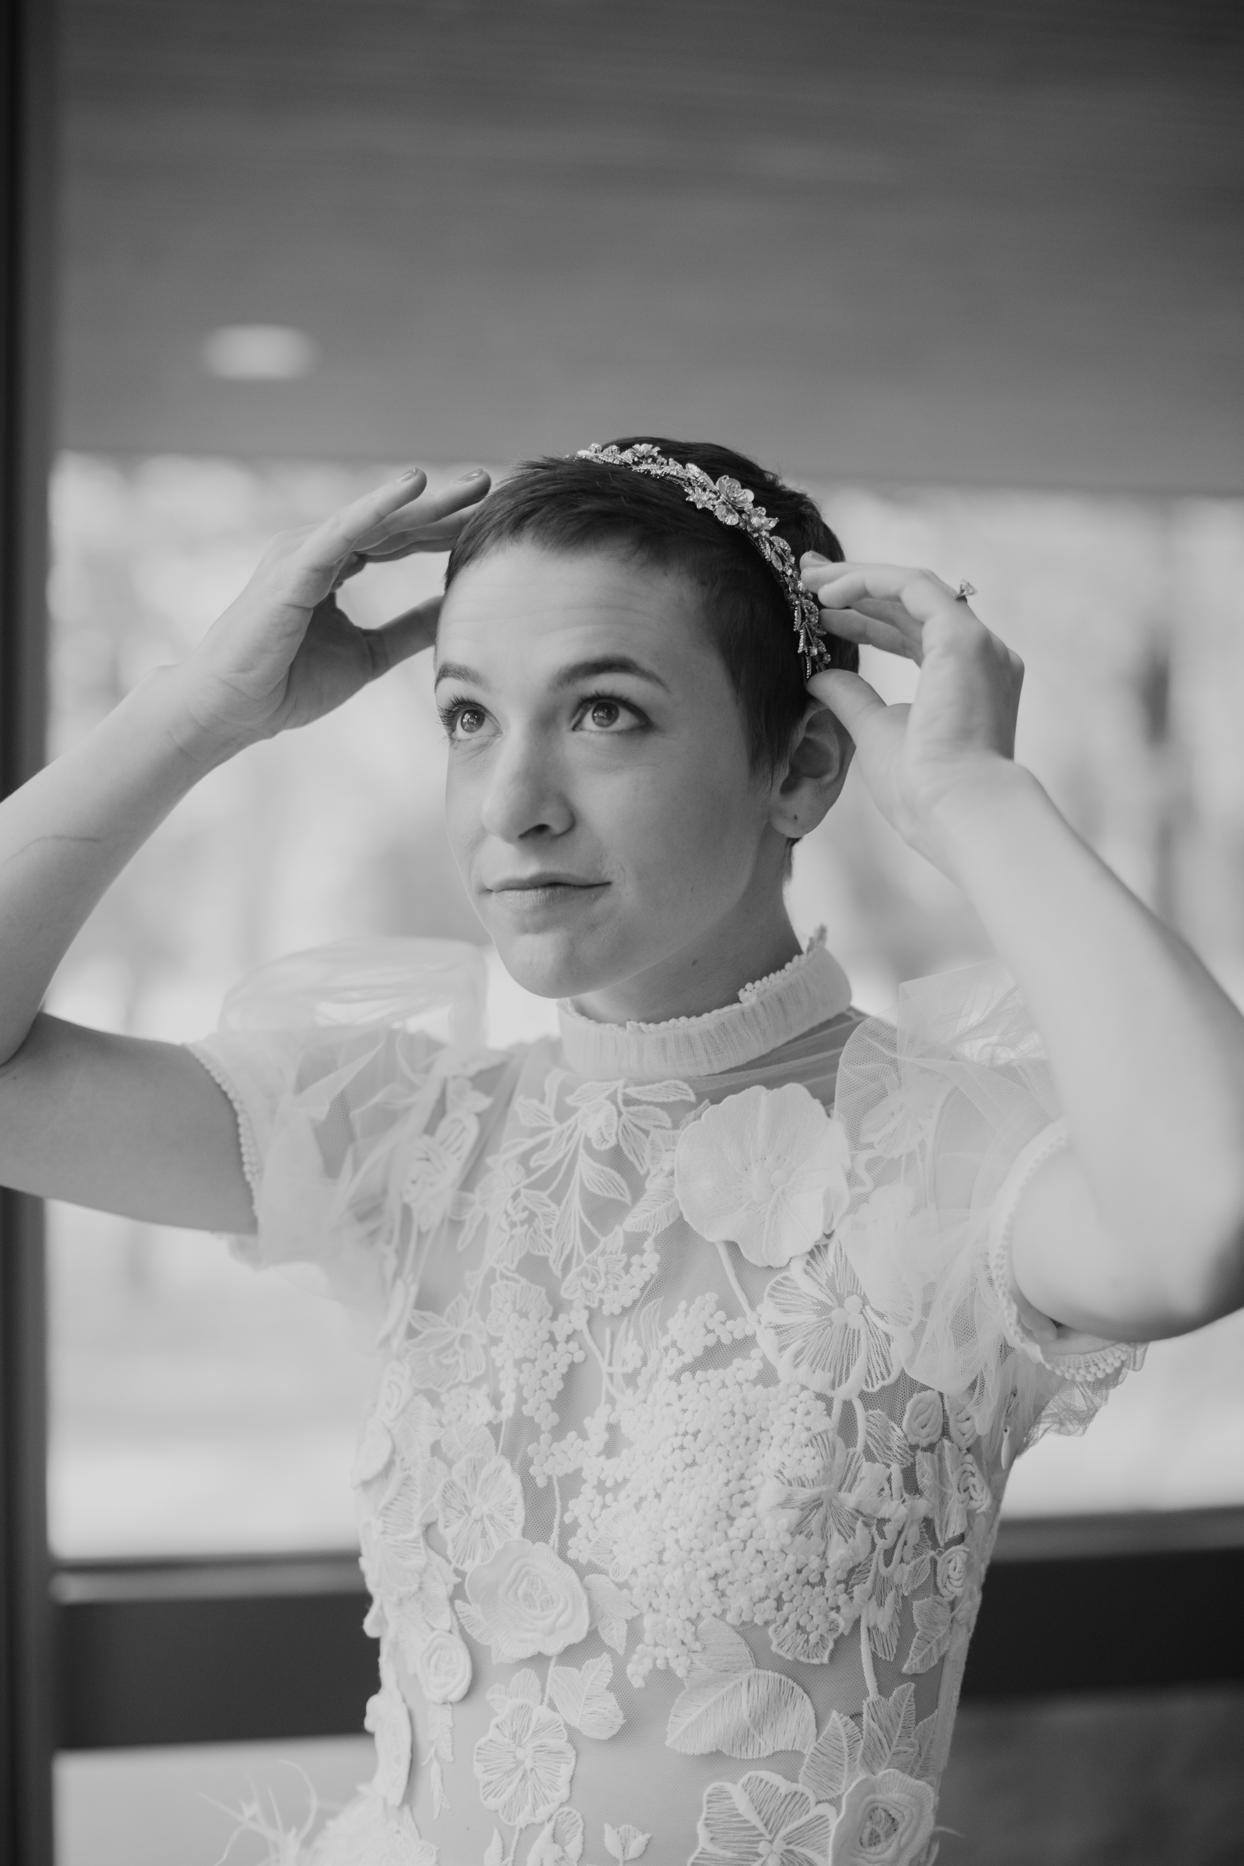 Bride placing a simple jeweled headband on her head